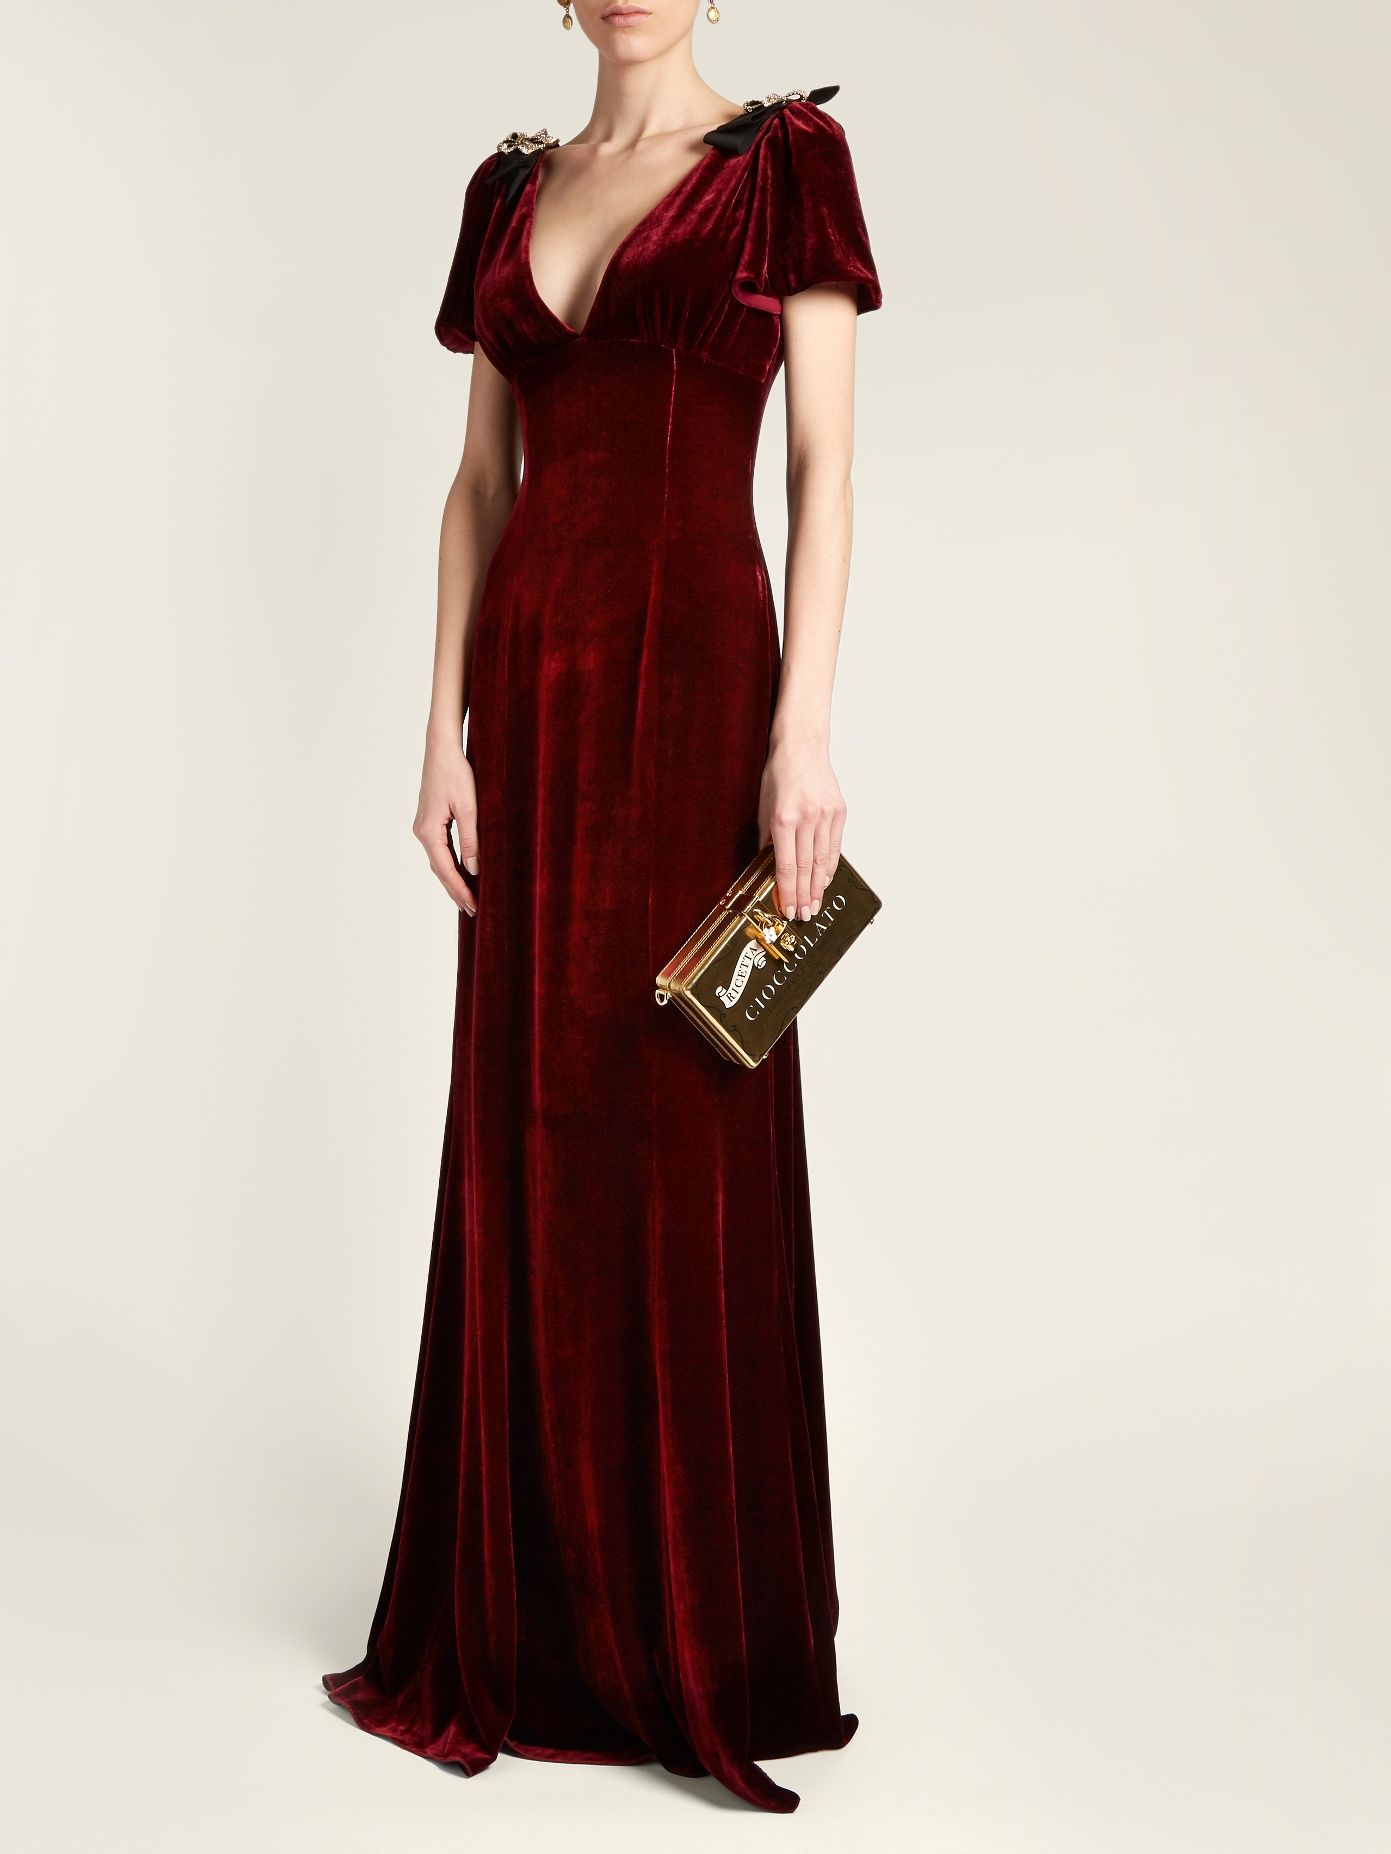 DOLCE & GABBANA Embellished V-neck velvet gown | Haute couture ...